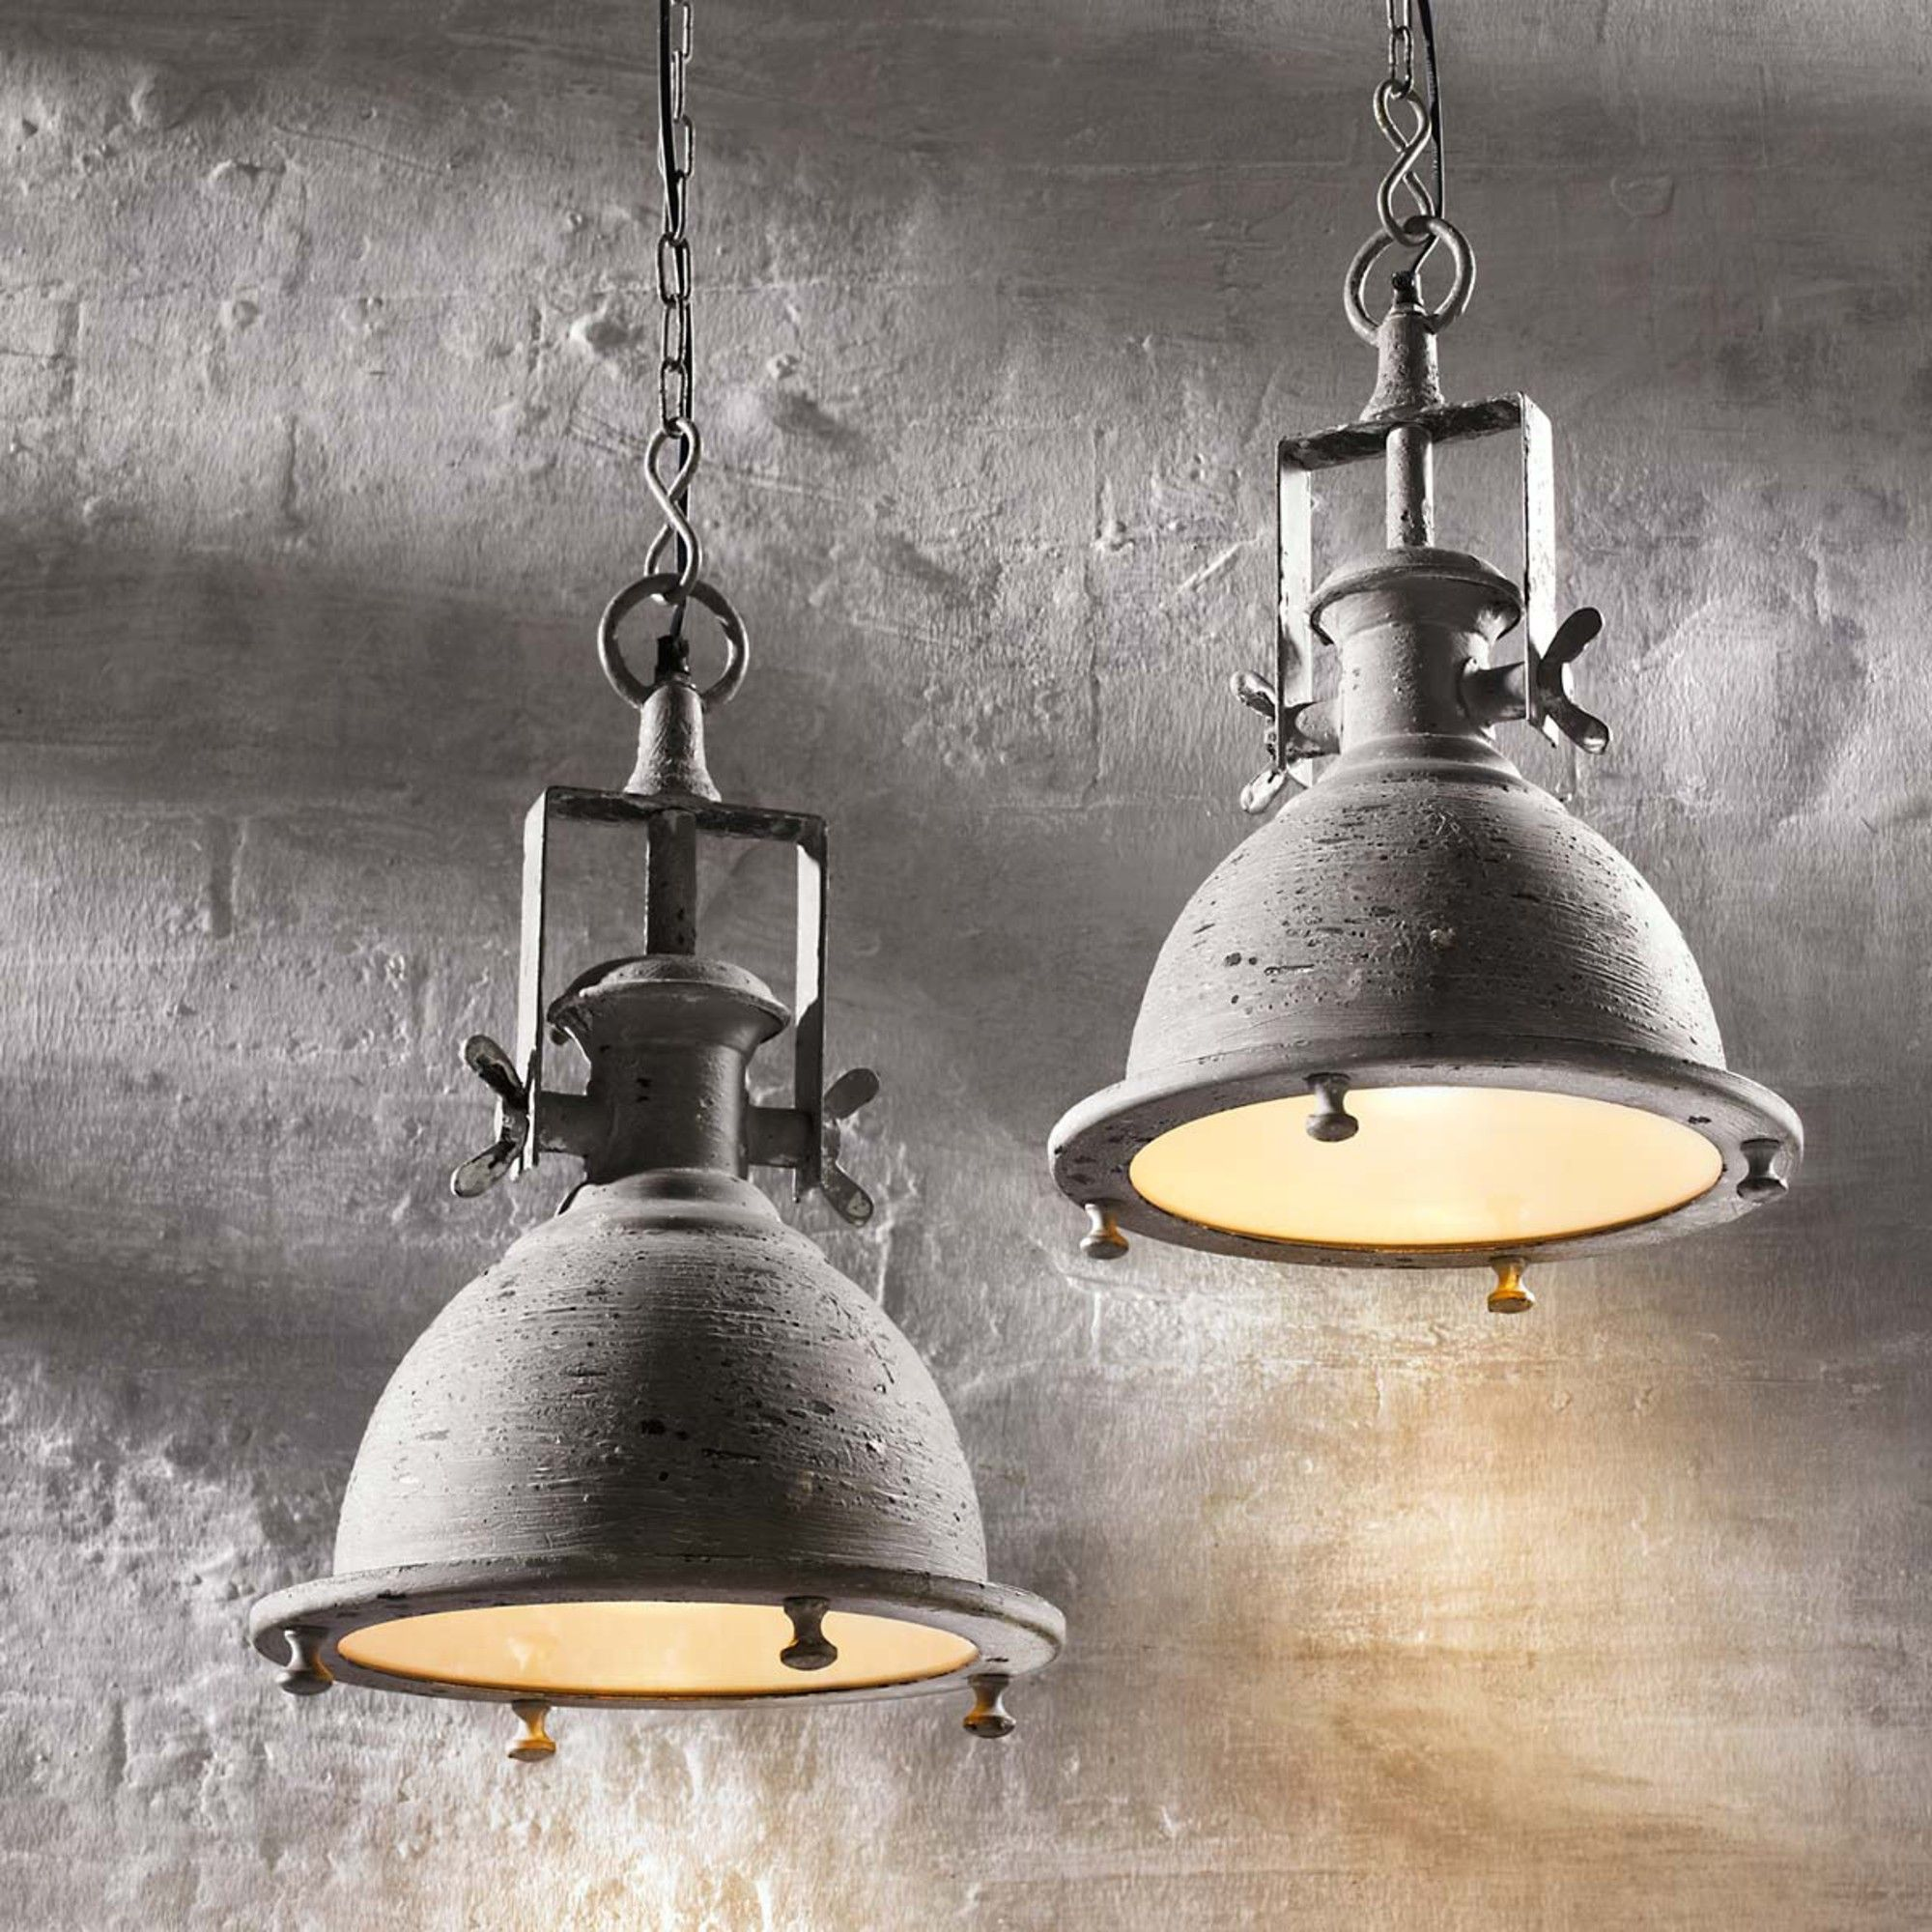 Inspirational Industrie Lampe Vintage Lampe Pendelleuchte Antik